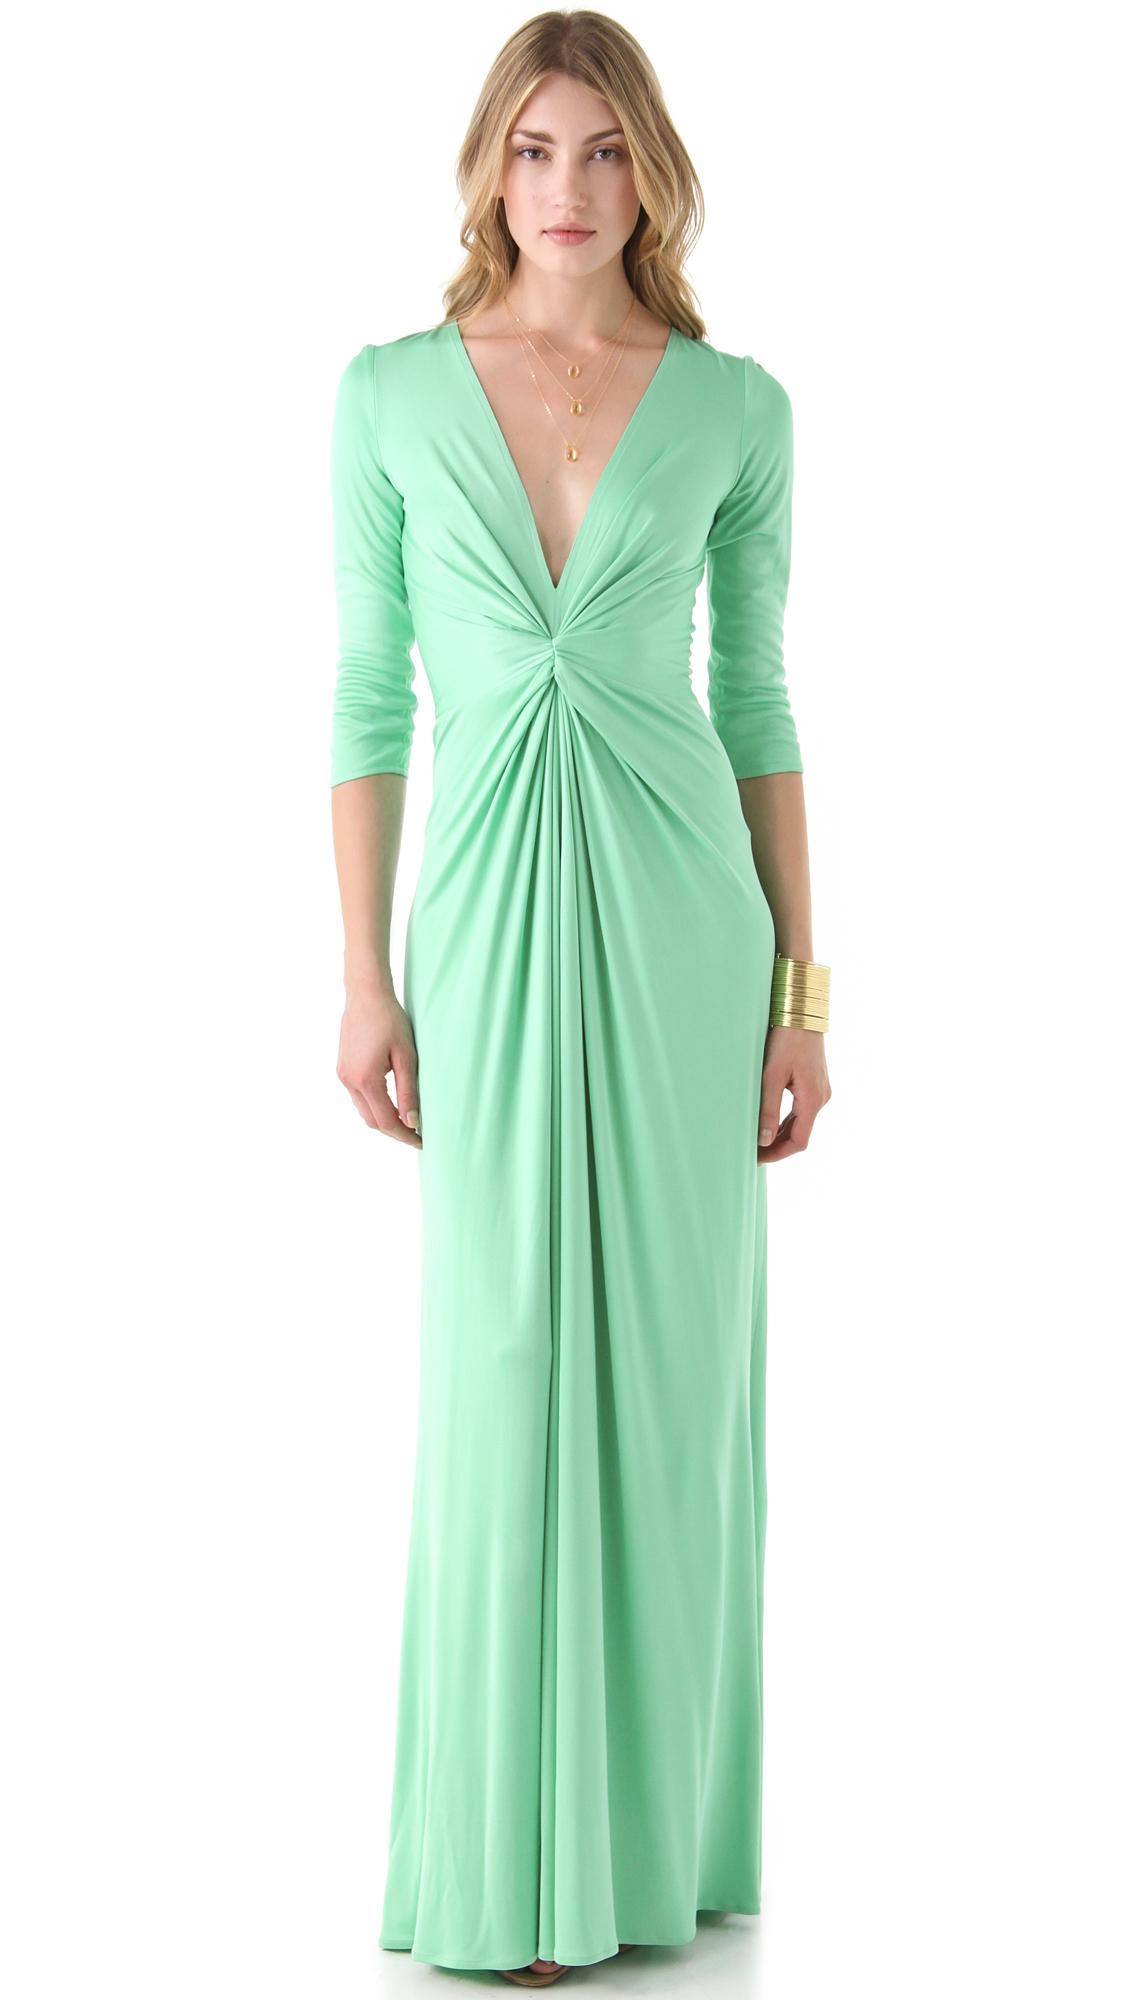 Issa Long Sleeve V Neck Dress in Green | Lyst